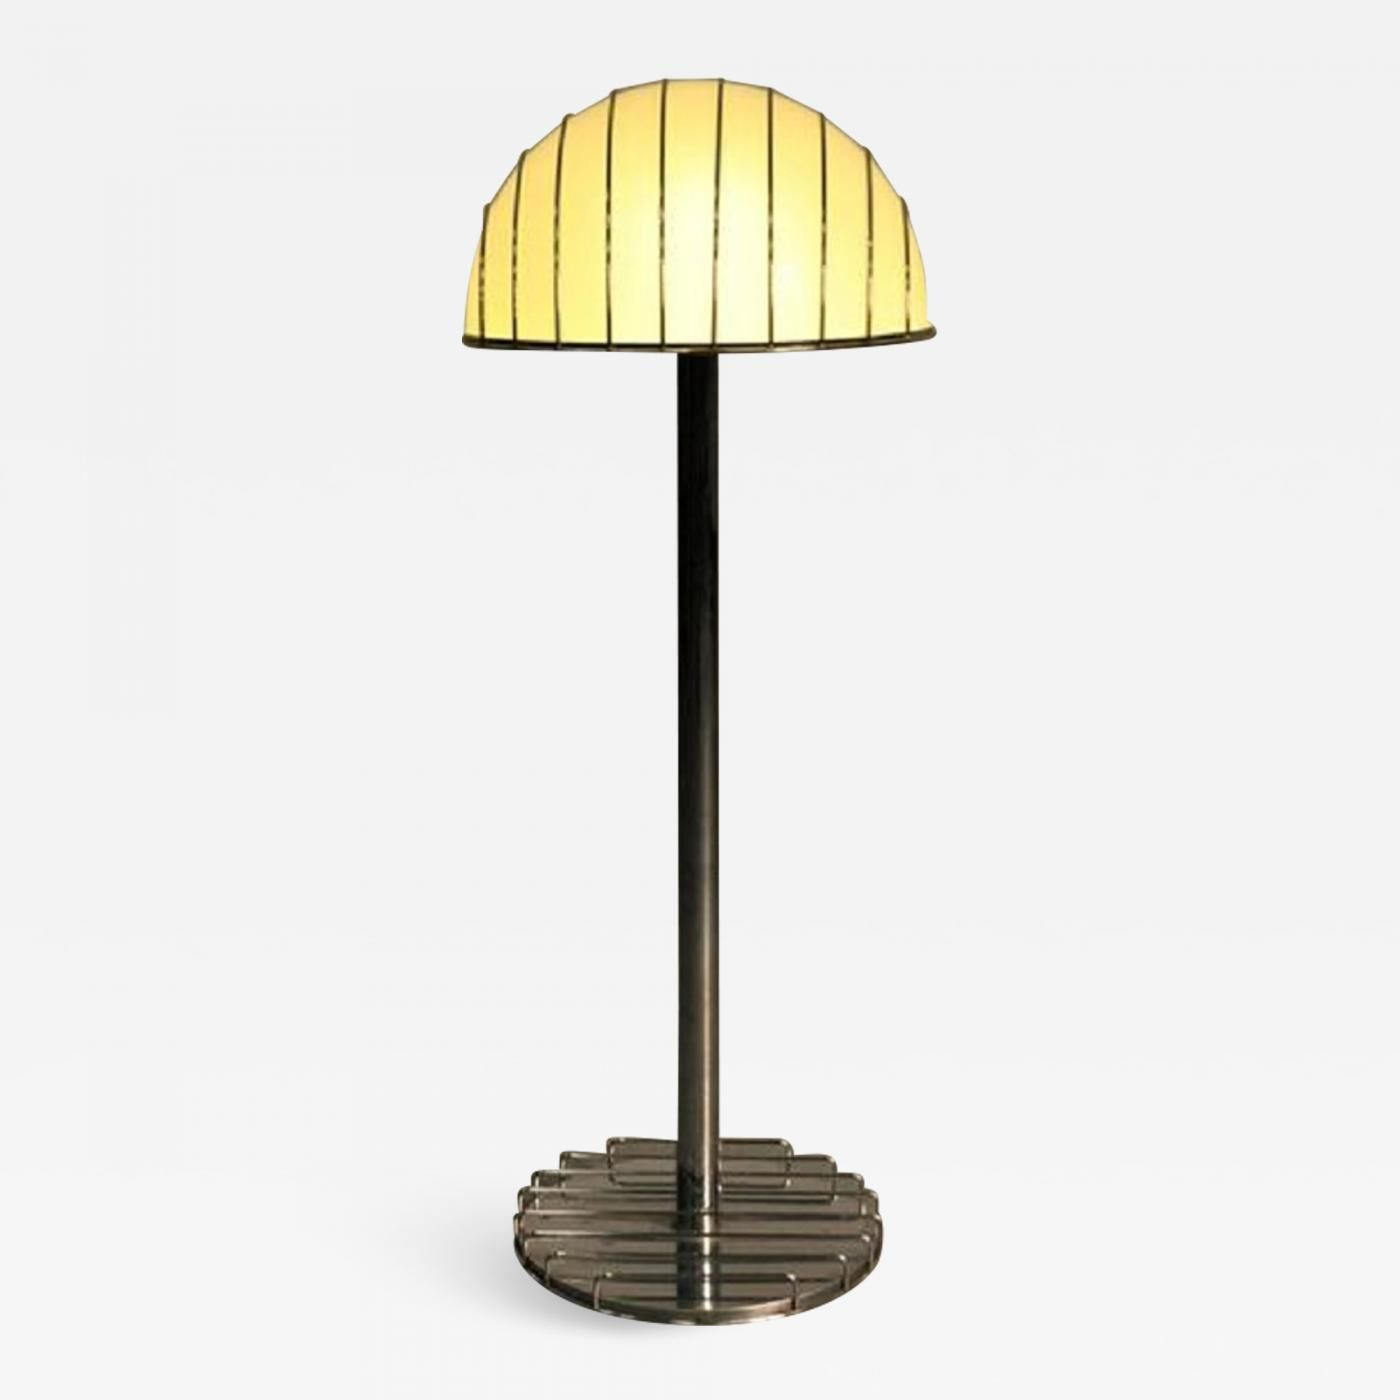 Adalberto Dal Lago 1960s Floor Lamp By Adalberto Dal Lago For Esperia Italy Floor Lamp Design Beautiful Floor Lamps Mid Century Modern Lighting